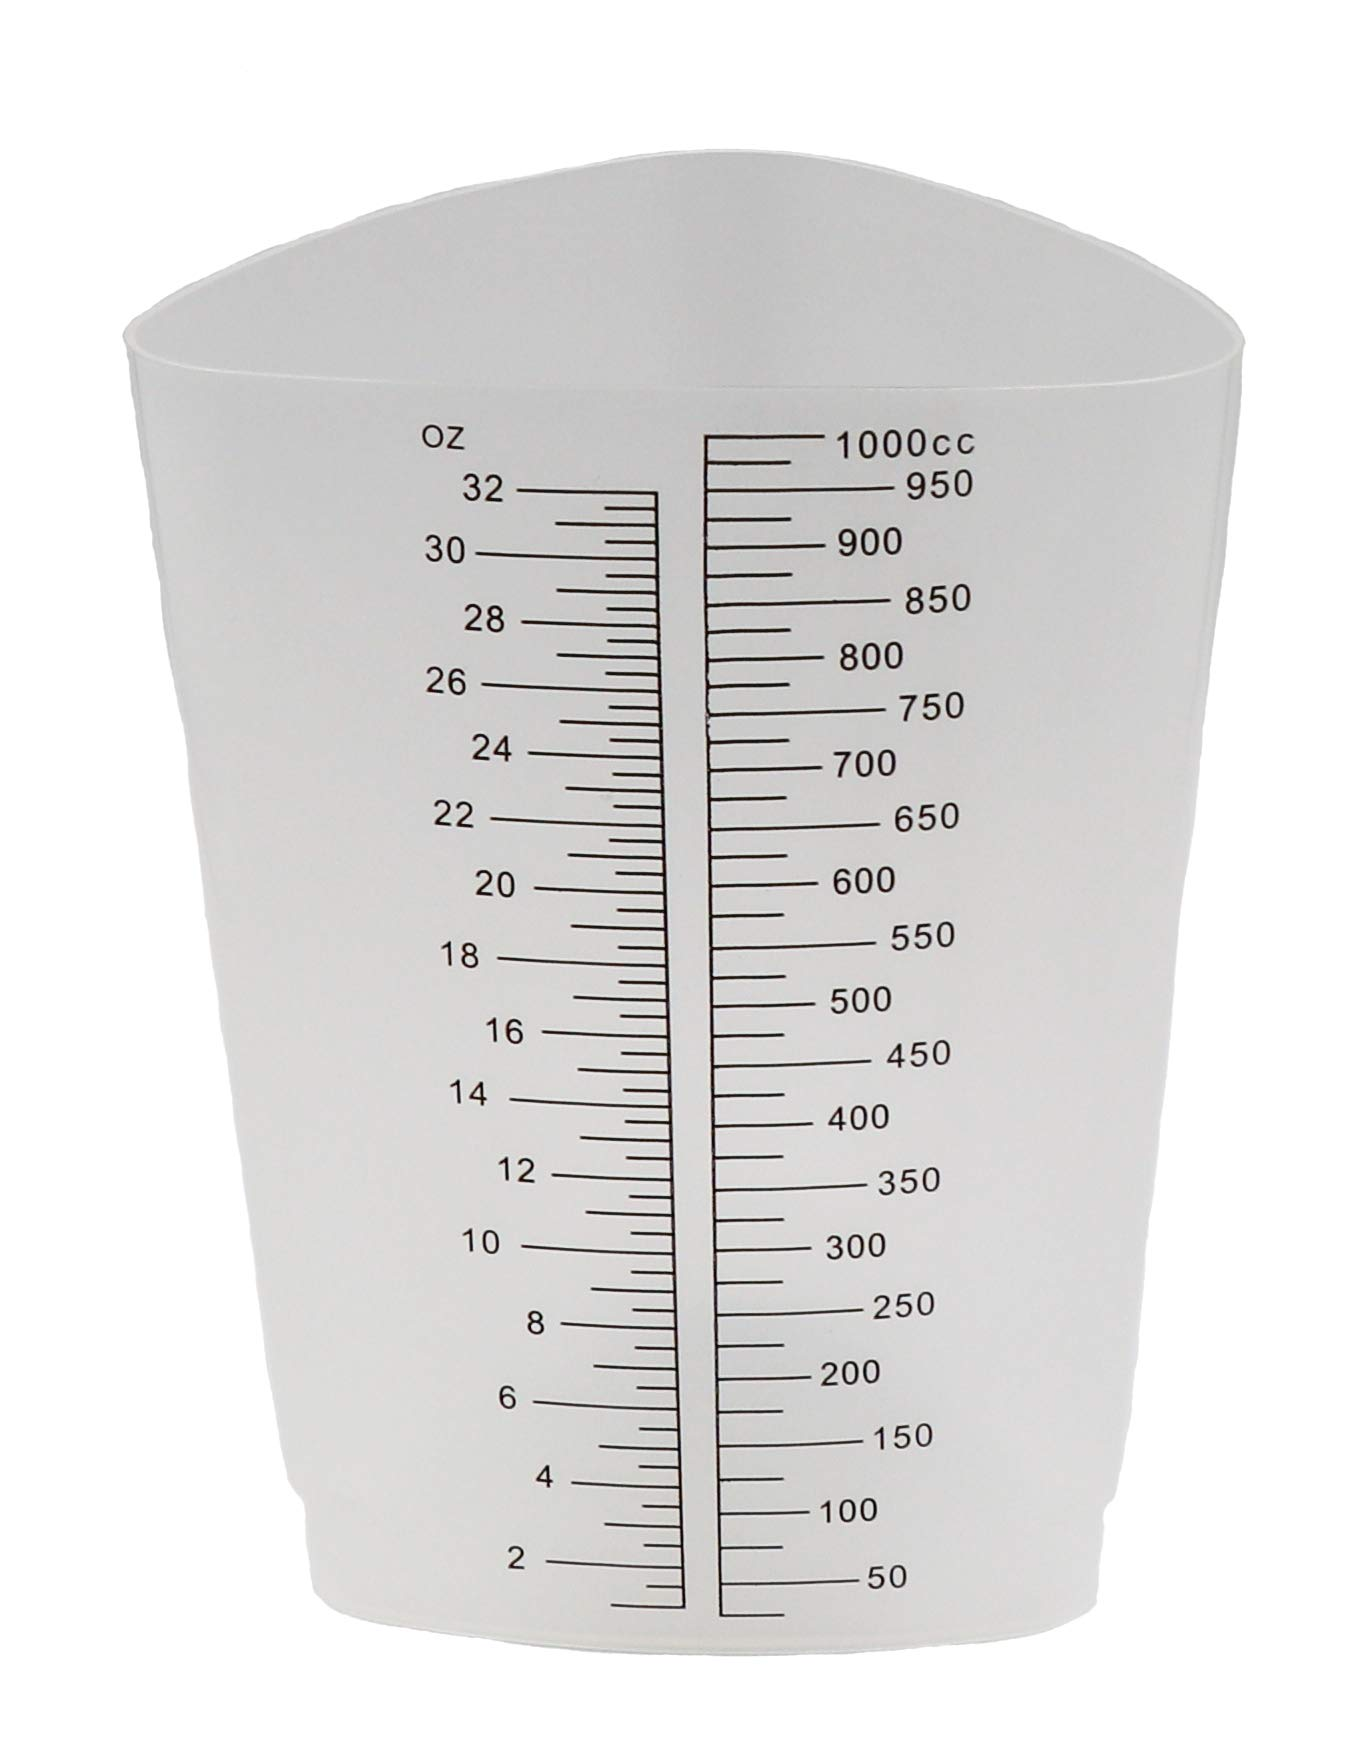 Graduated Triangular Polypropylene Laboratory Container 32oz/1000cc - Pack of 10